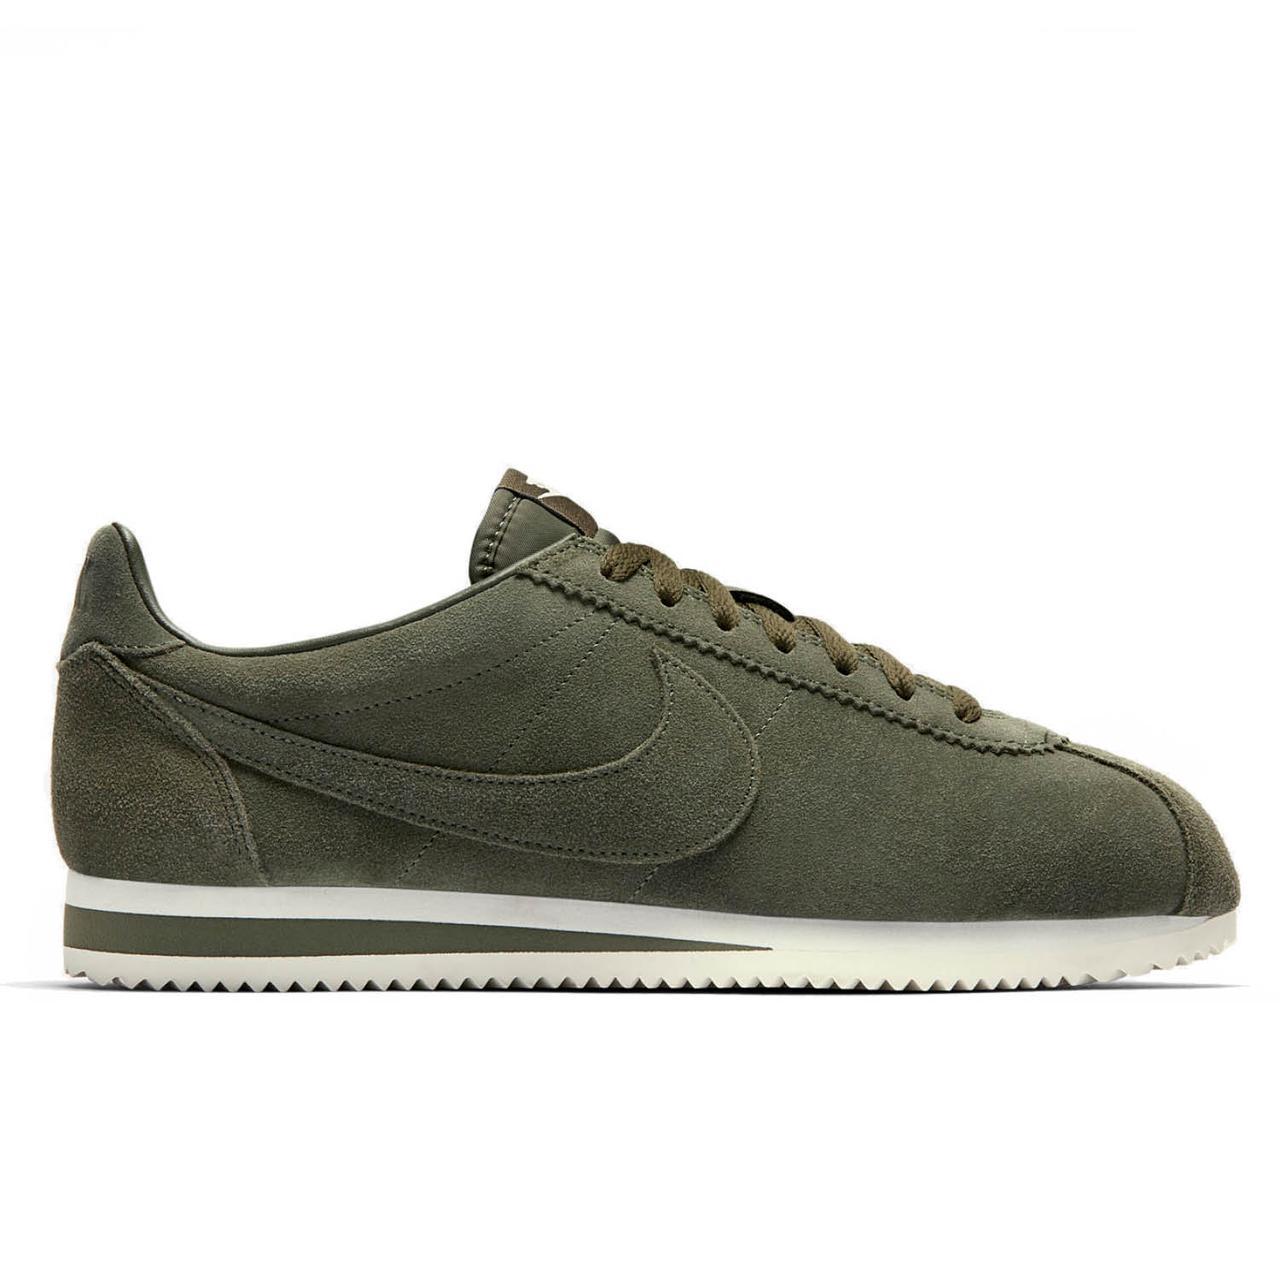 2e51766b616455 Оригинальные кроссовки Nike Classic Cortez SE Cargo Khaki White - Sport-Sneakers  - Оригинальные кроссовки